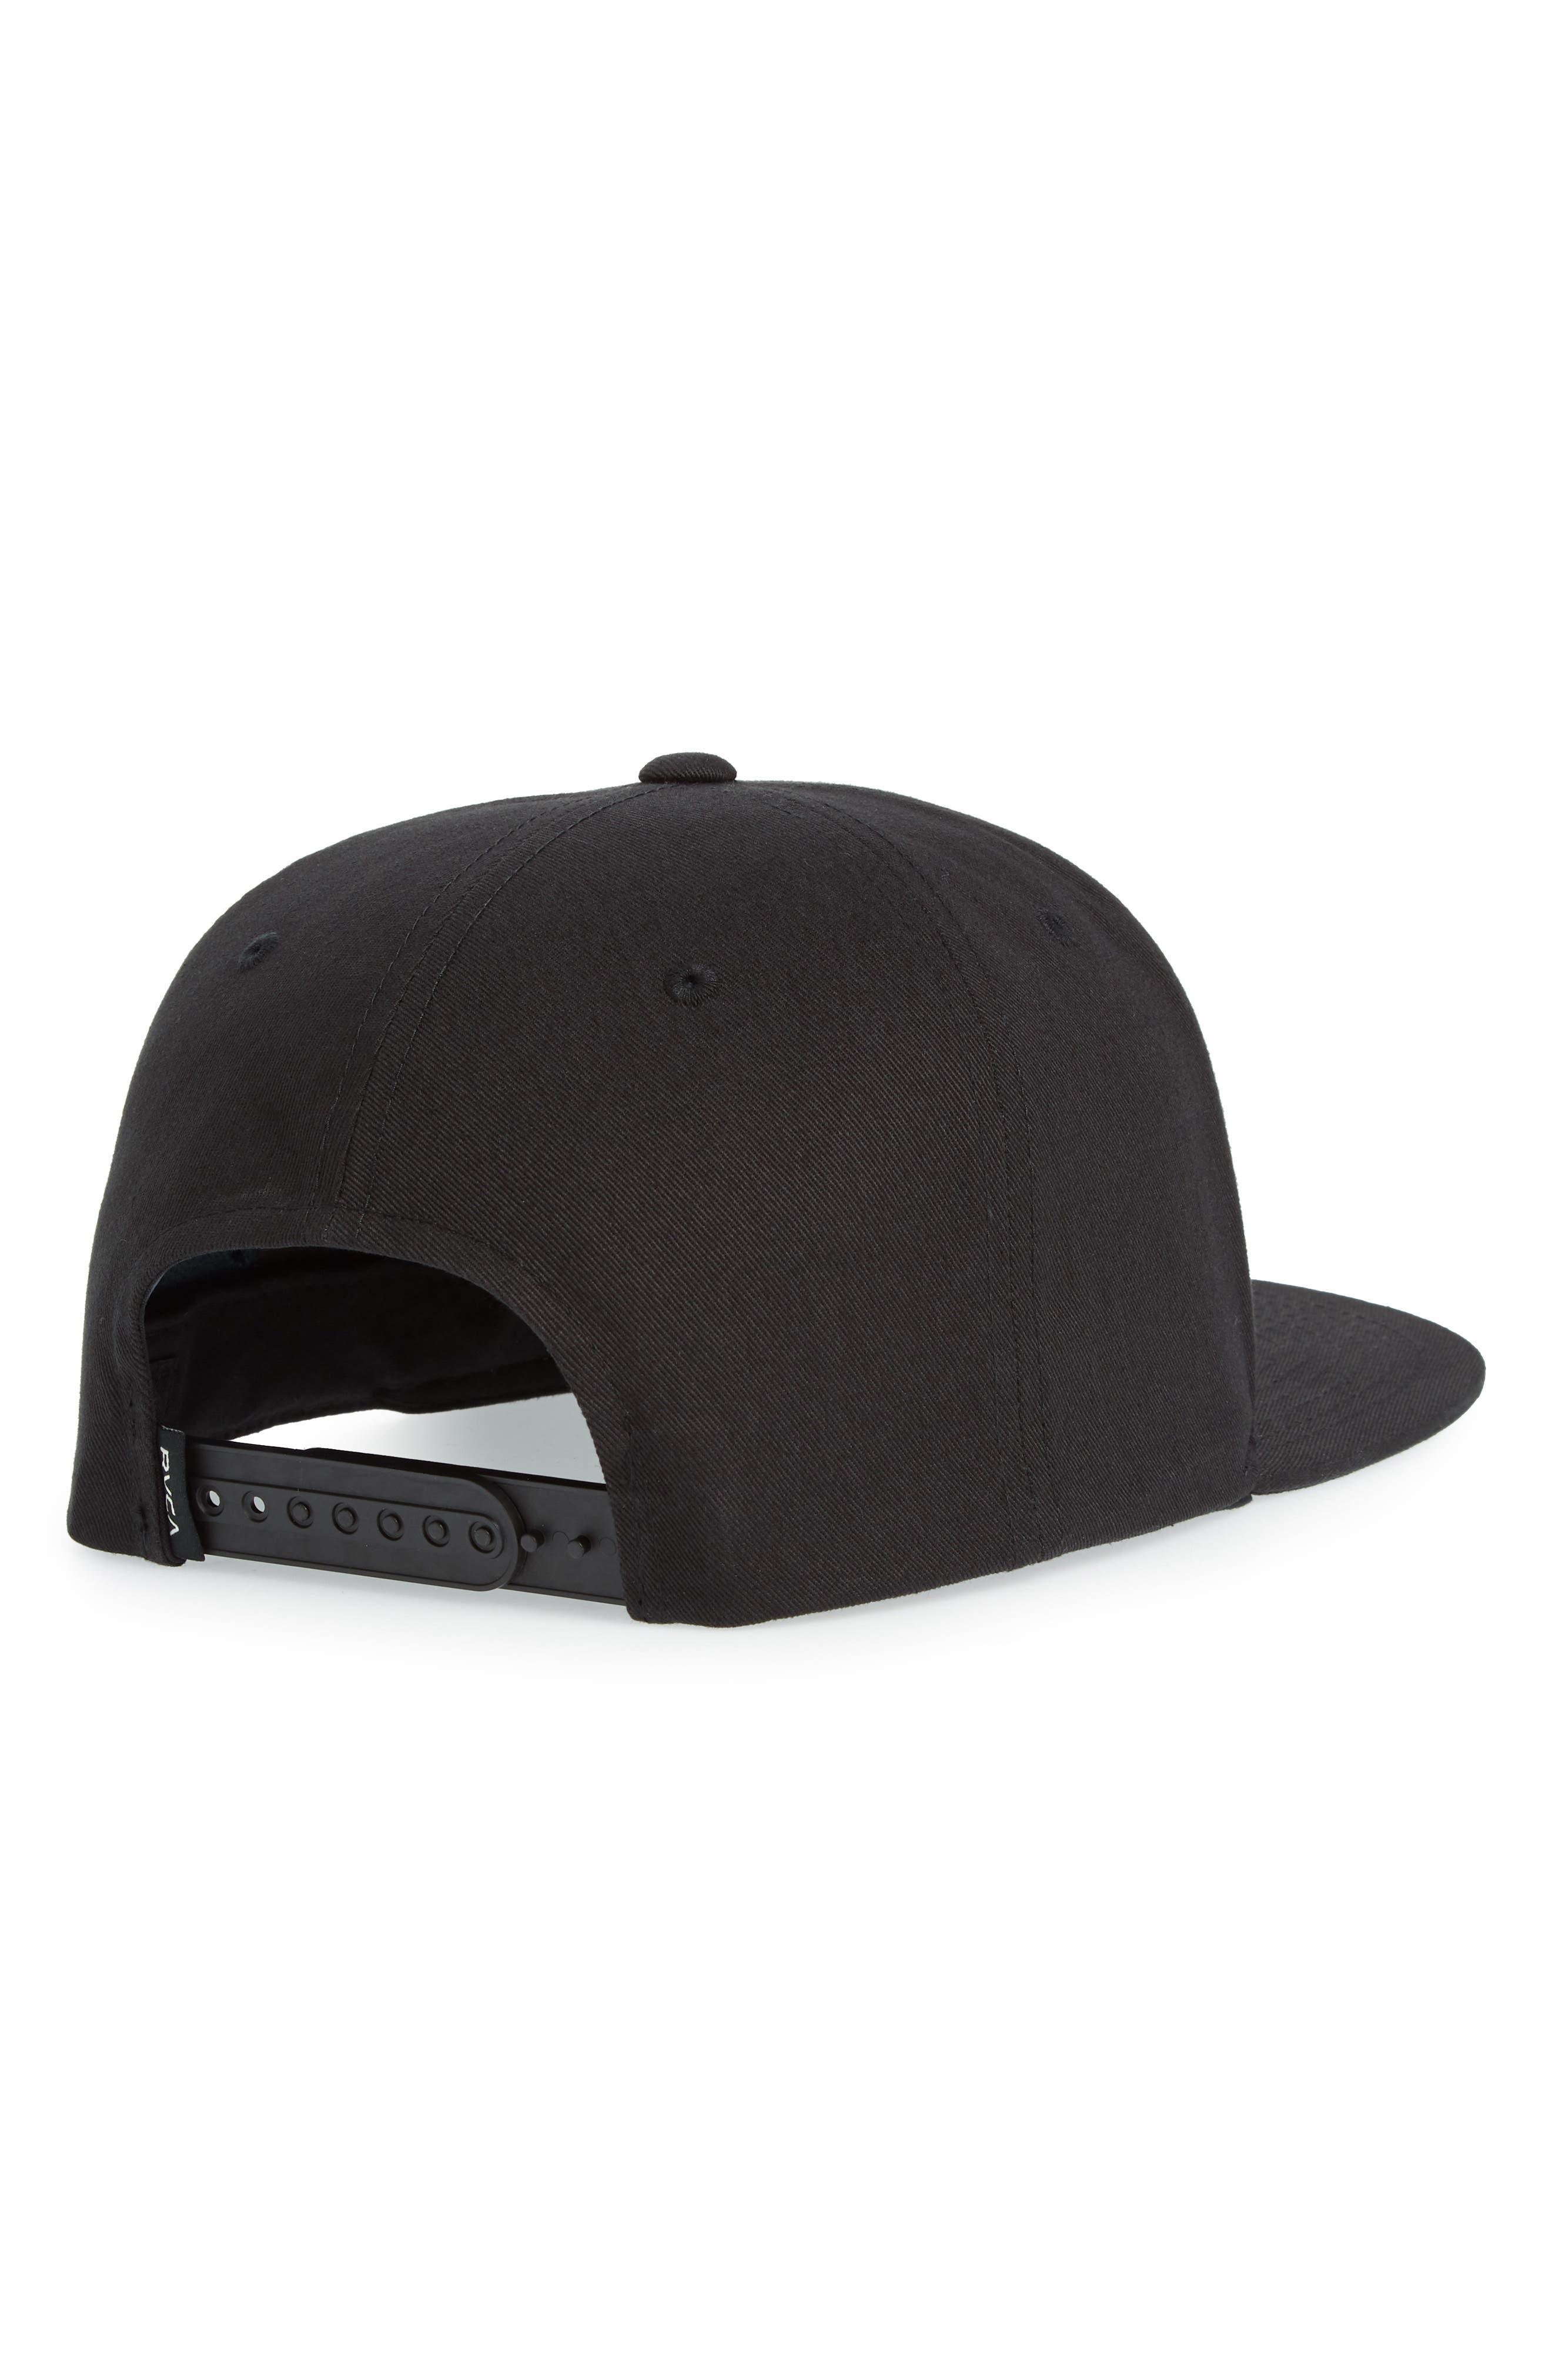 VA Snapback II Snapback Hat,                             Alternate thumbnail 2, color,                             BLACK/ BLACK